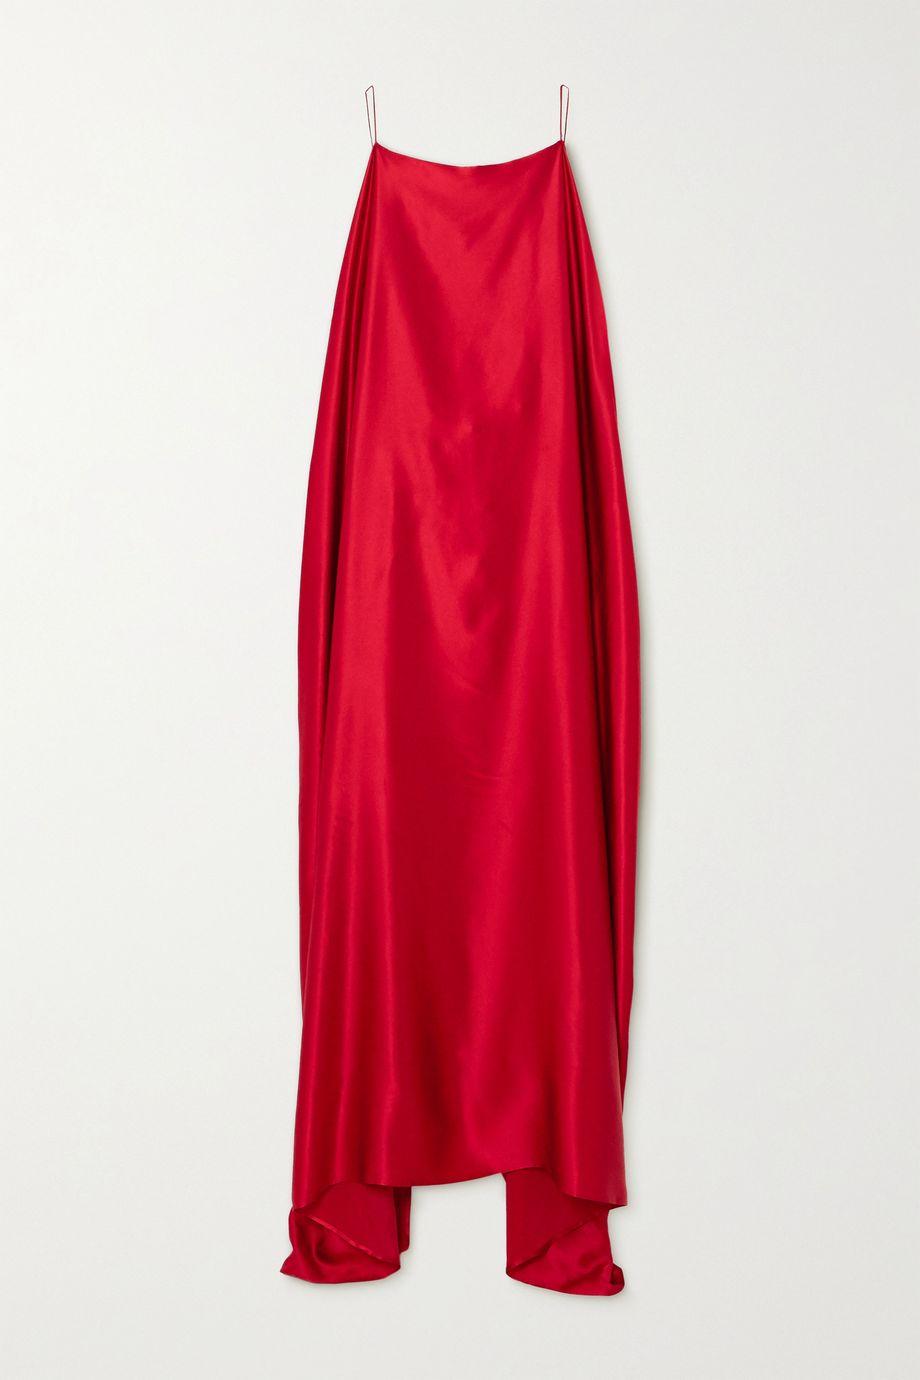 BERNADETTE Meredith draped asymmetric silk-satin dress